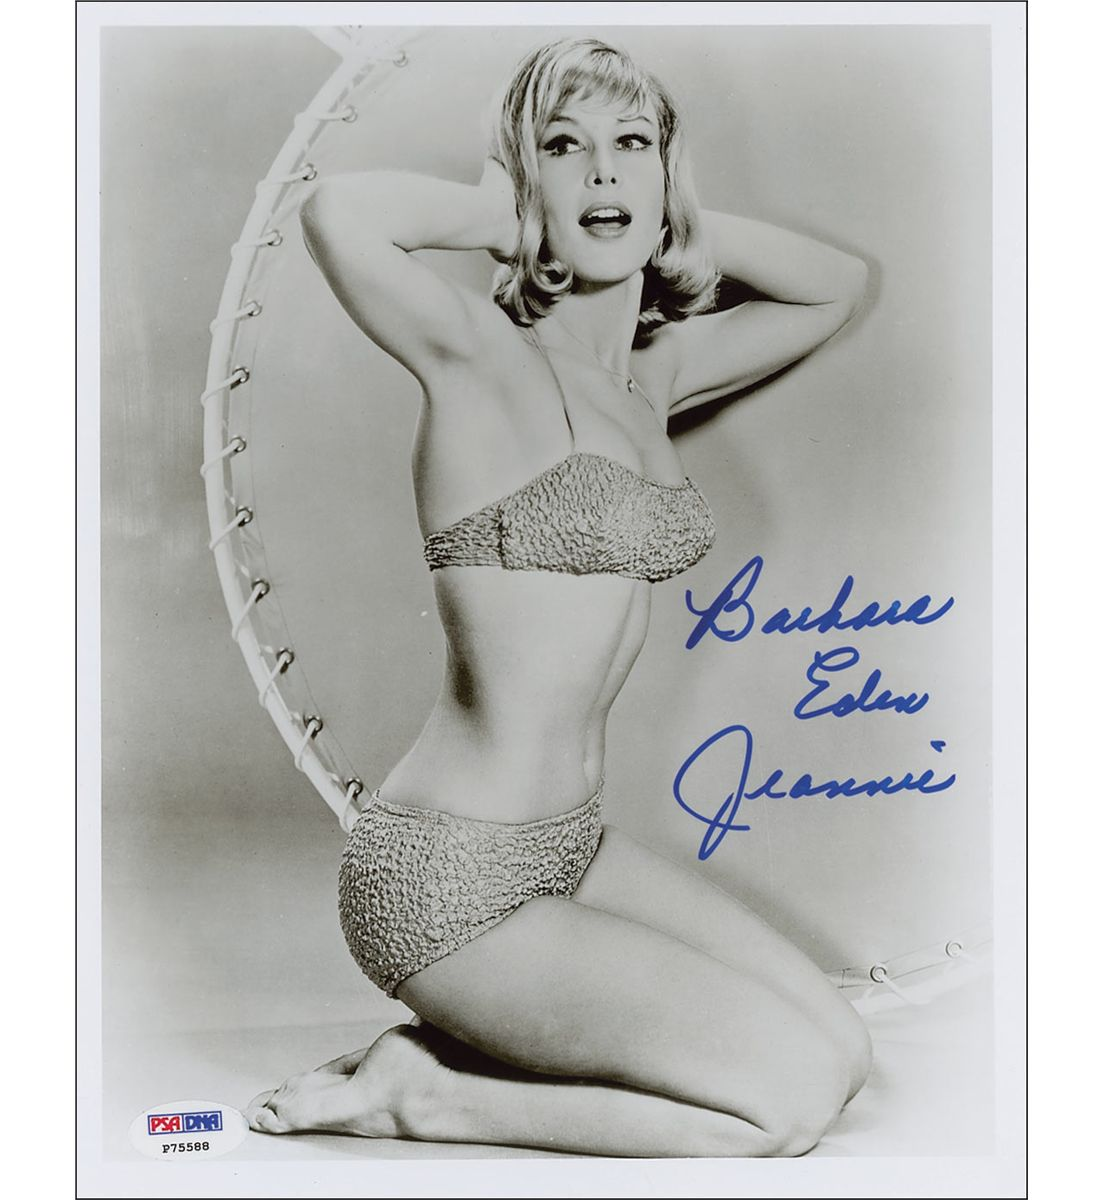 eden photos Barbara bikini